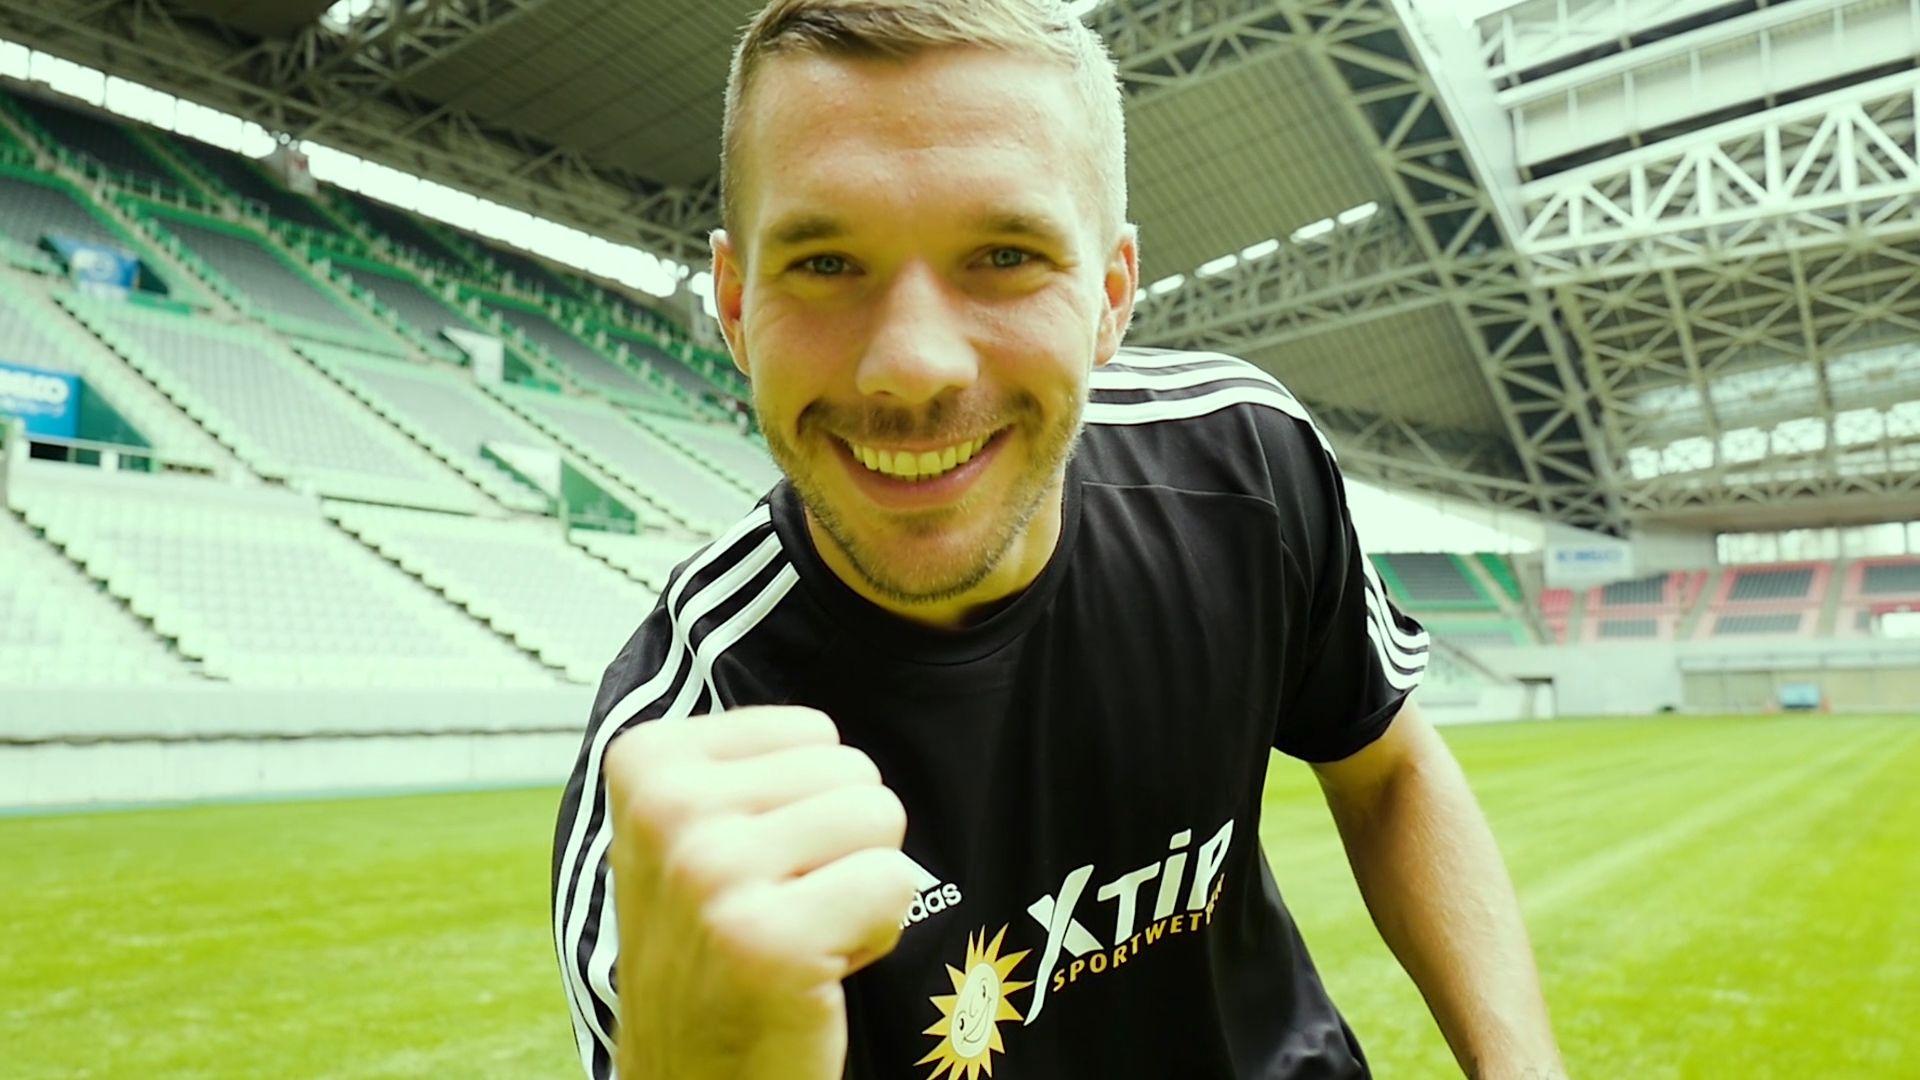 Fußballer Lukas Podolski